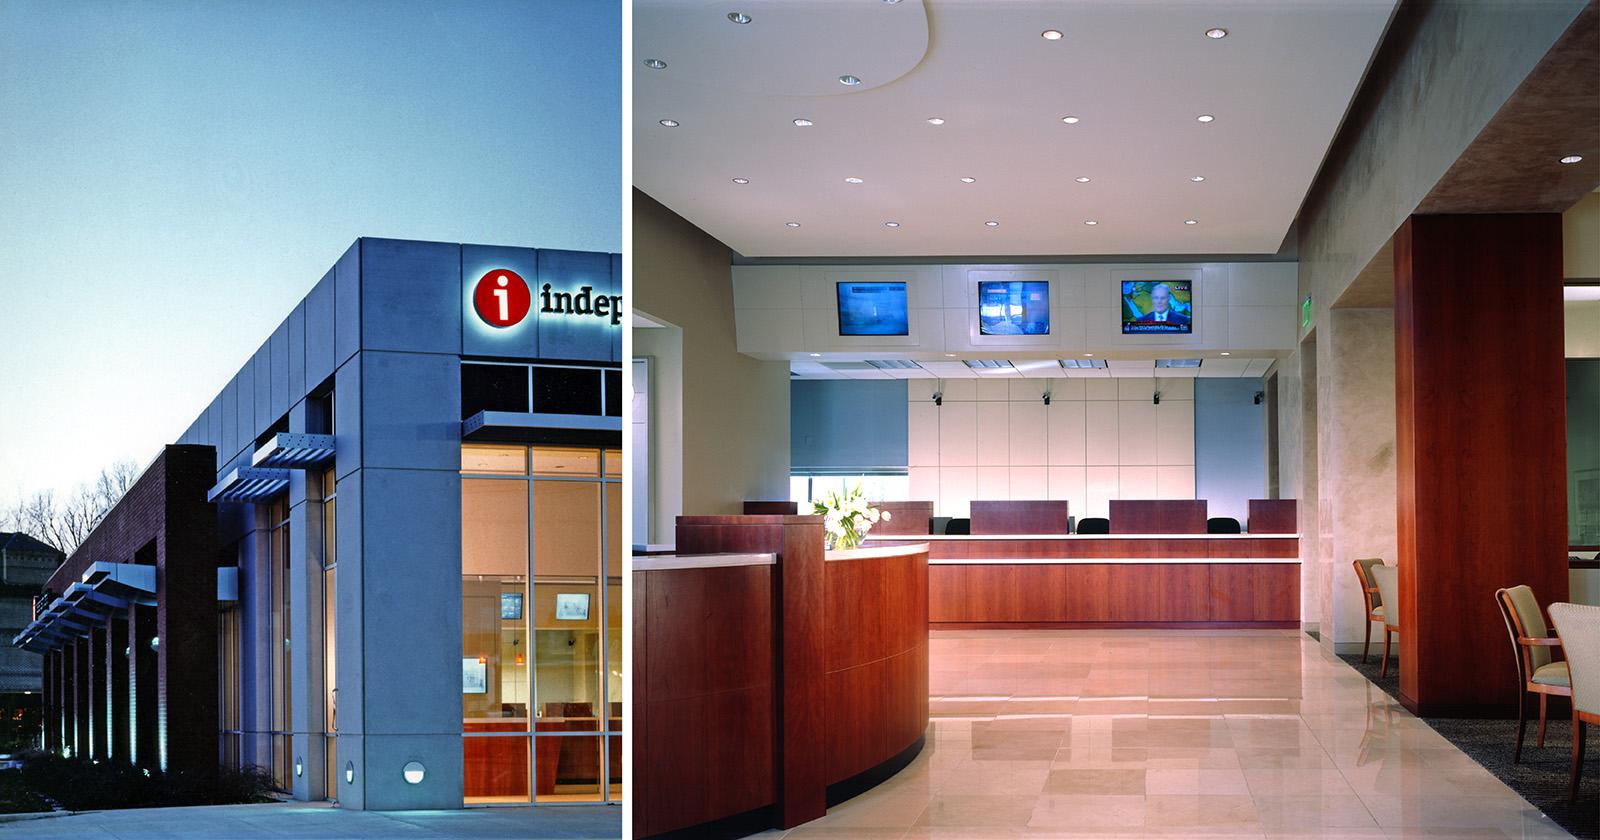 Independent Bank – Collierville , Collierville, TN